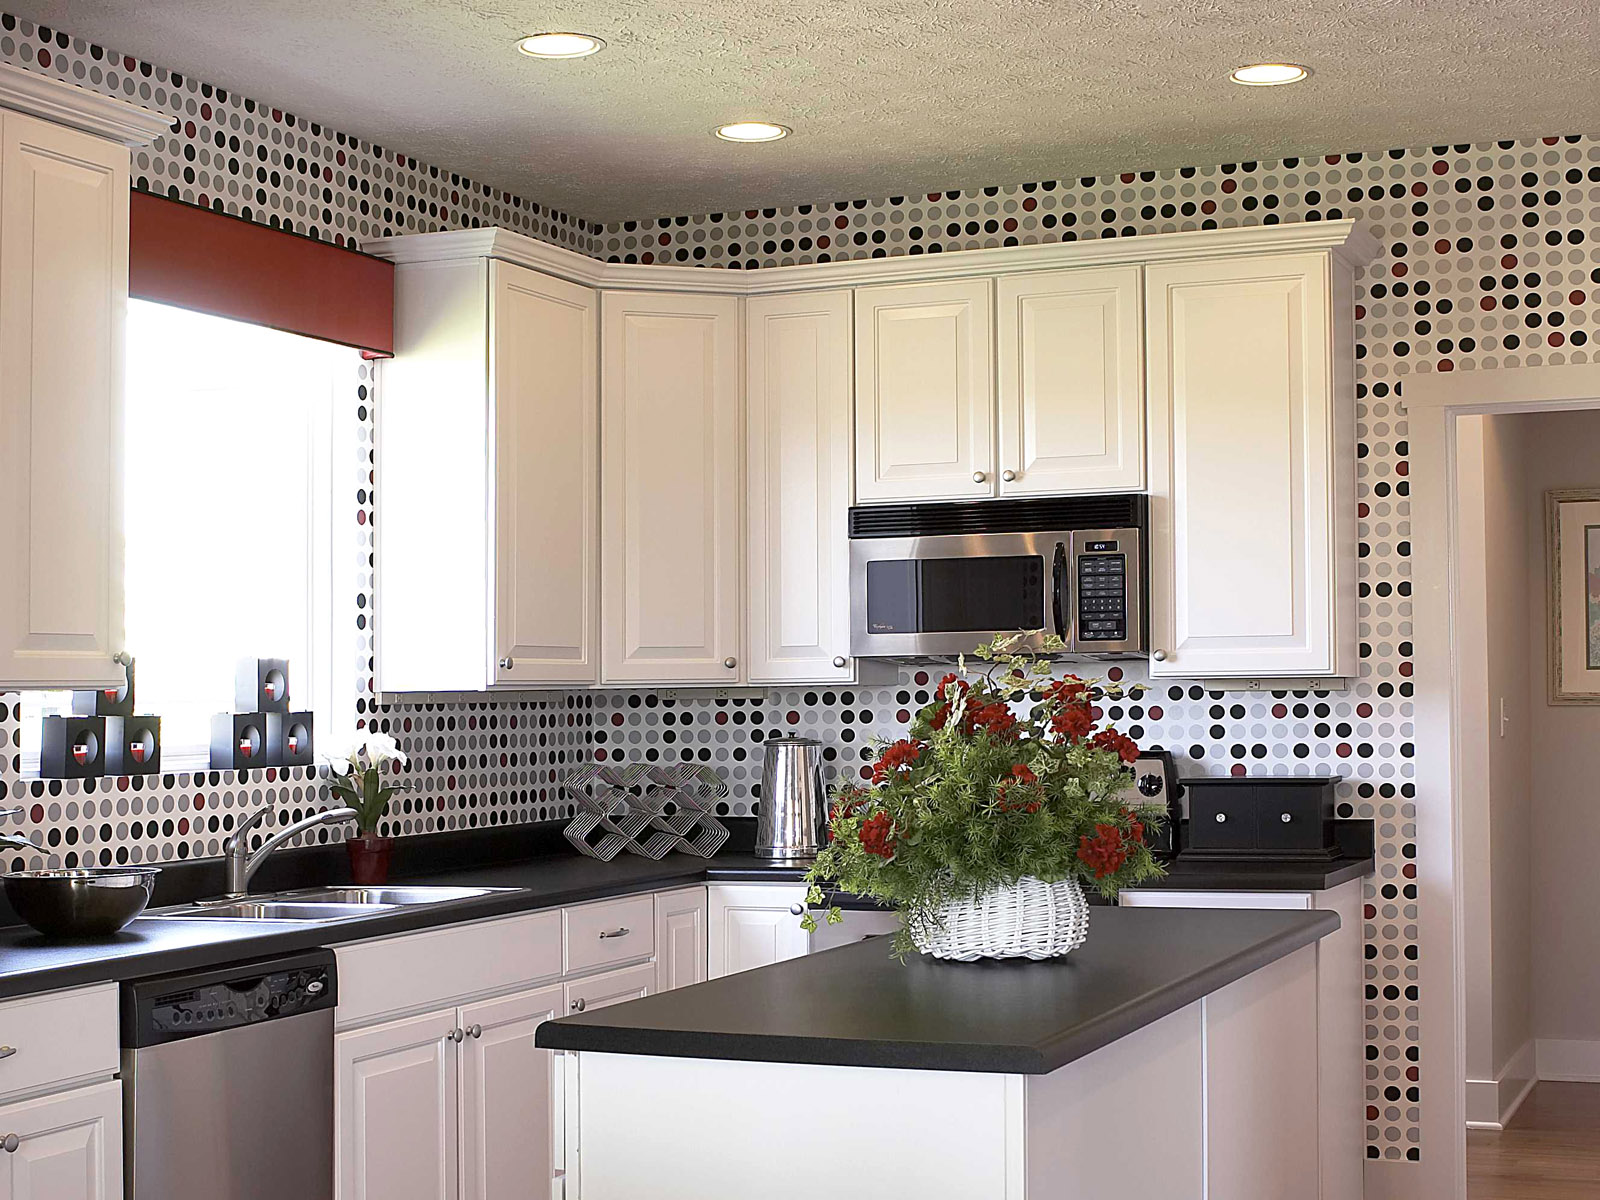 Dotted-Kitchen-Tiles Dotted Kitchen Tiles Idea